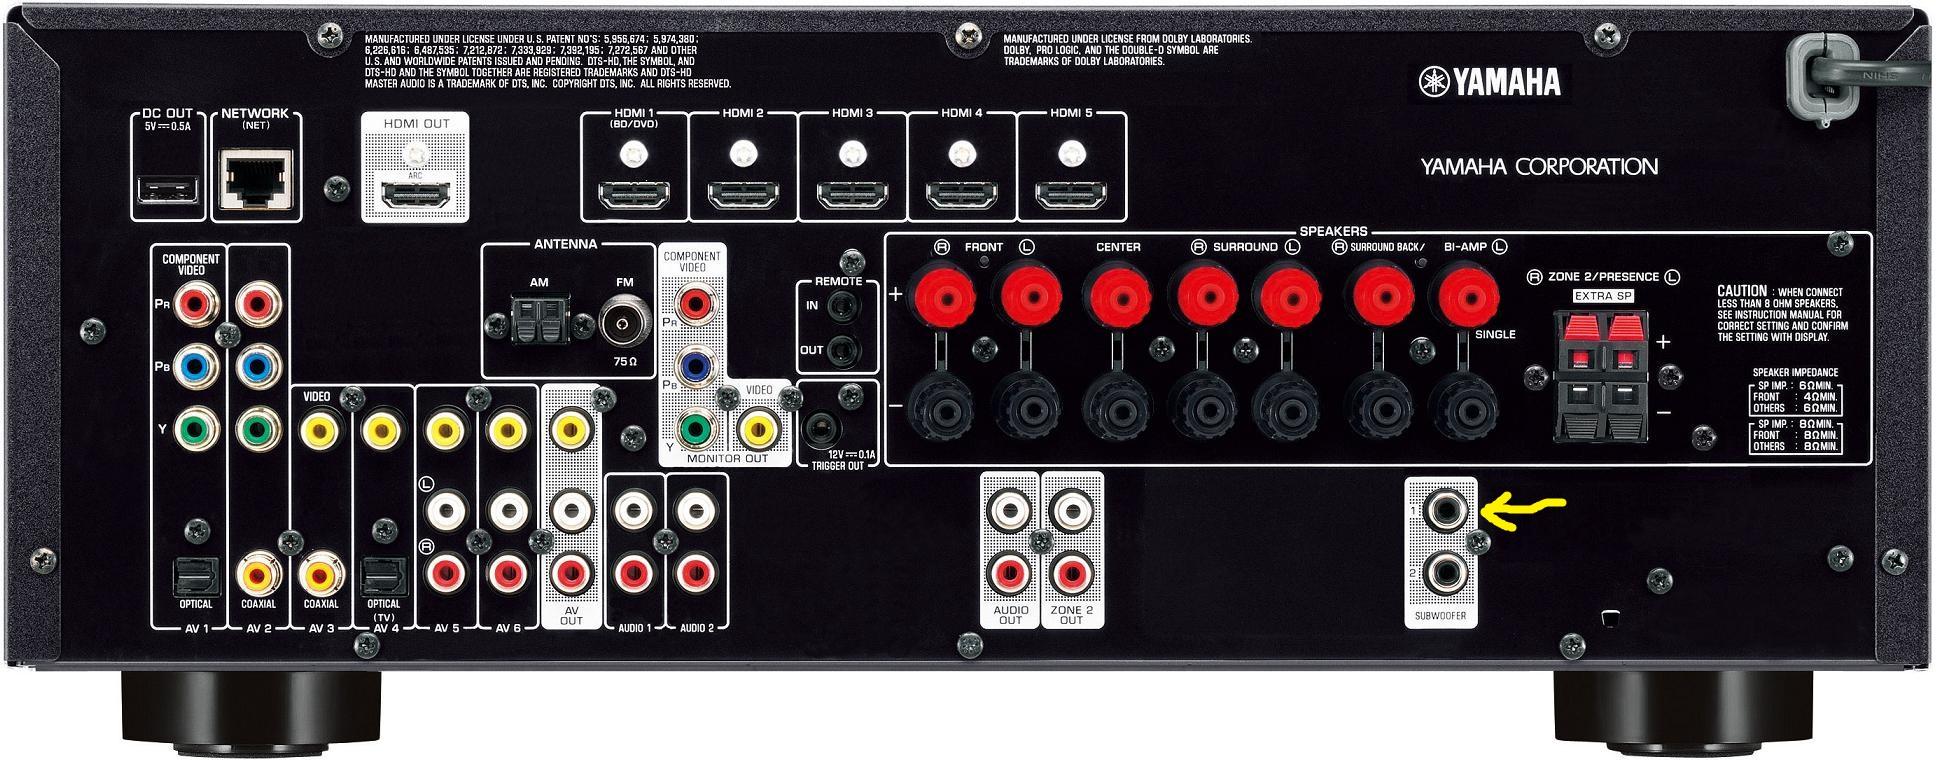 yamaha receiver rx v373 manual